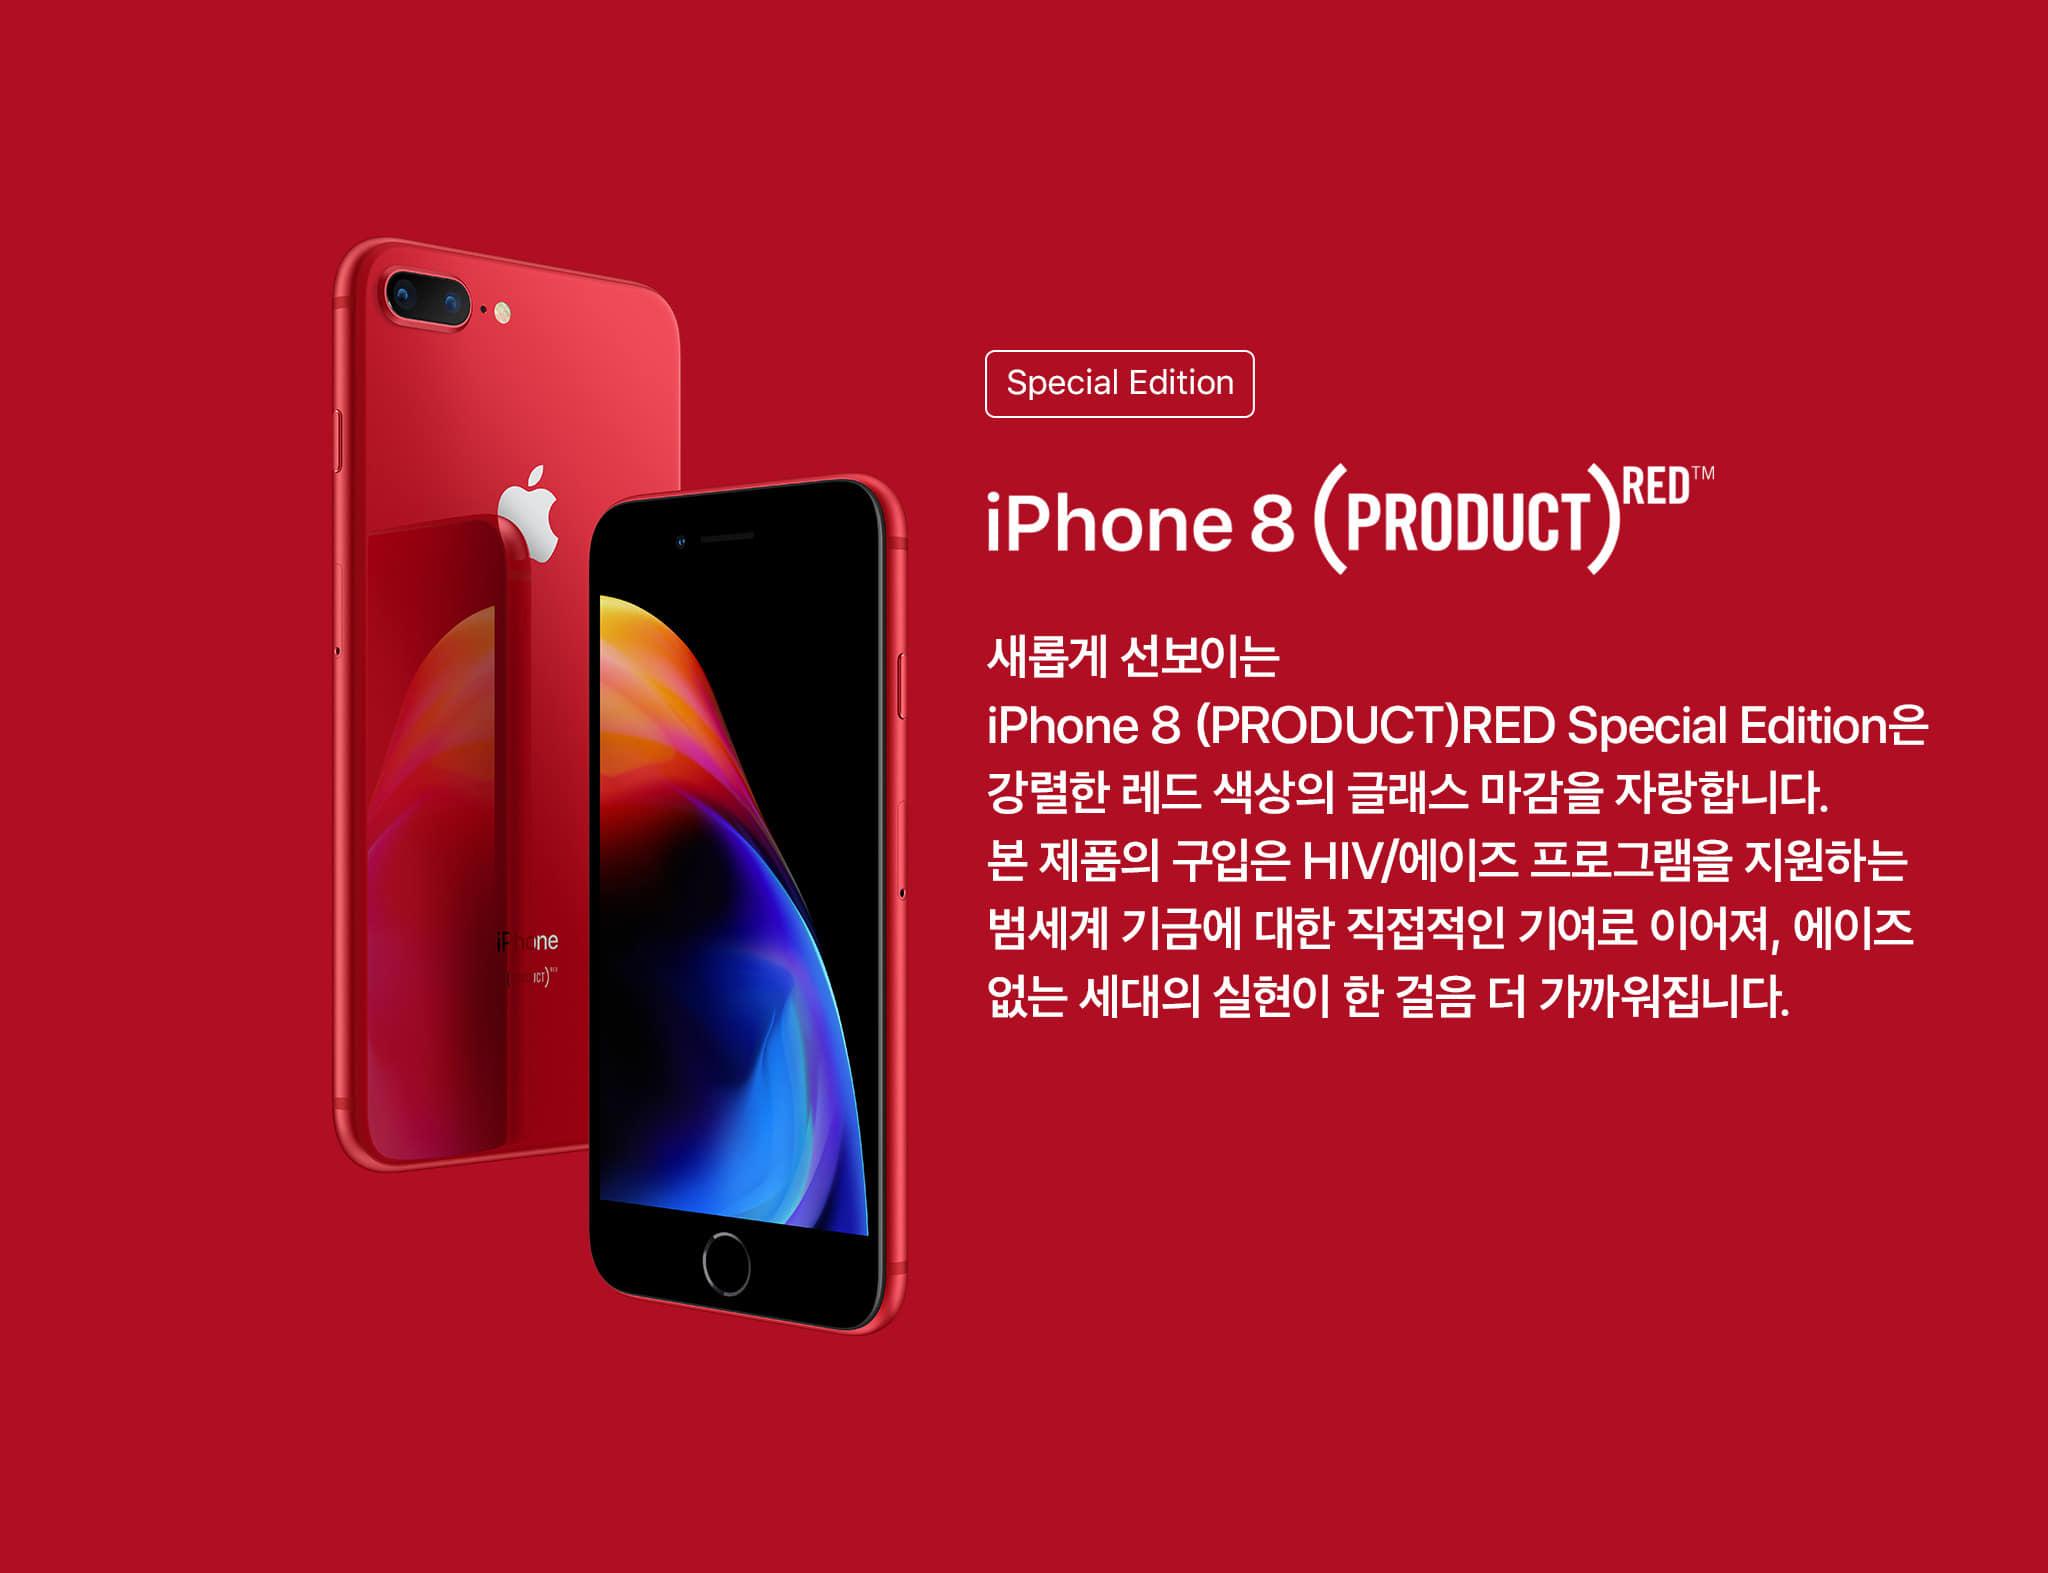 iPhone8(product)red 새롭게 선보이는 iPhone8(produst)red special edition은 강렬한 레드 색상의 글래스 마감을 자랑합니다. 본제품의 구입은 hiv/에이즈 프로그램을 지원하는 범세계 기금에 대한 직접적인 기여로 이어져, 에이즈 없는 세대의 실현이 한 걸음 더 가까워집니다.